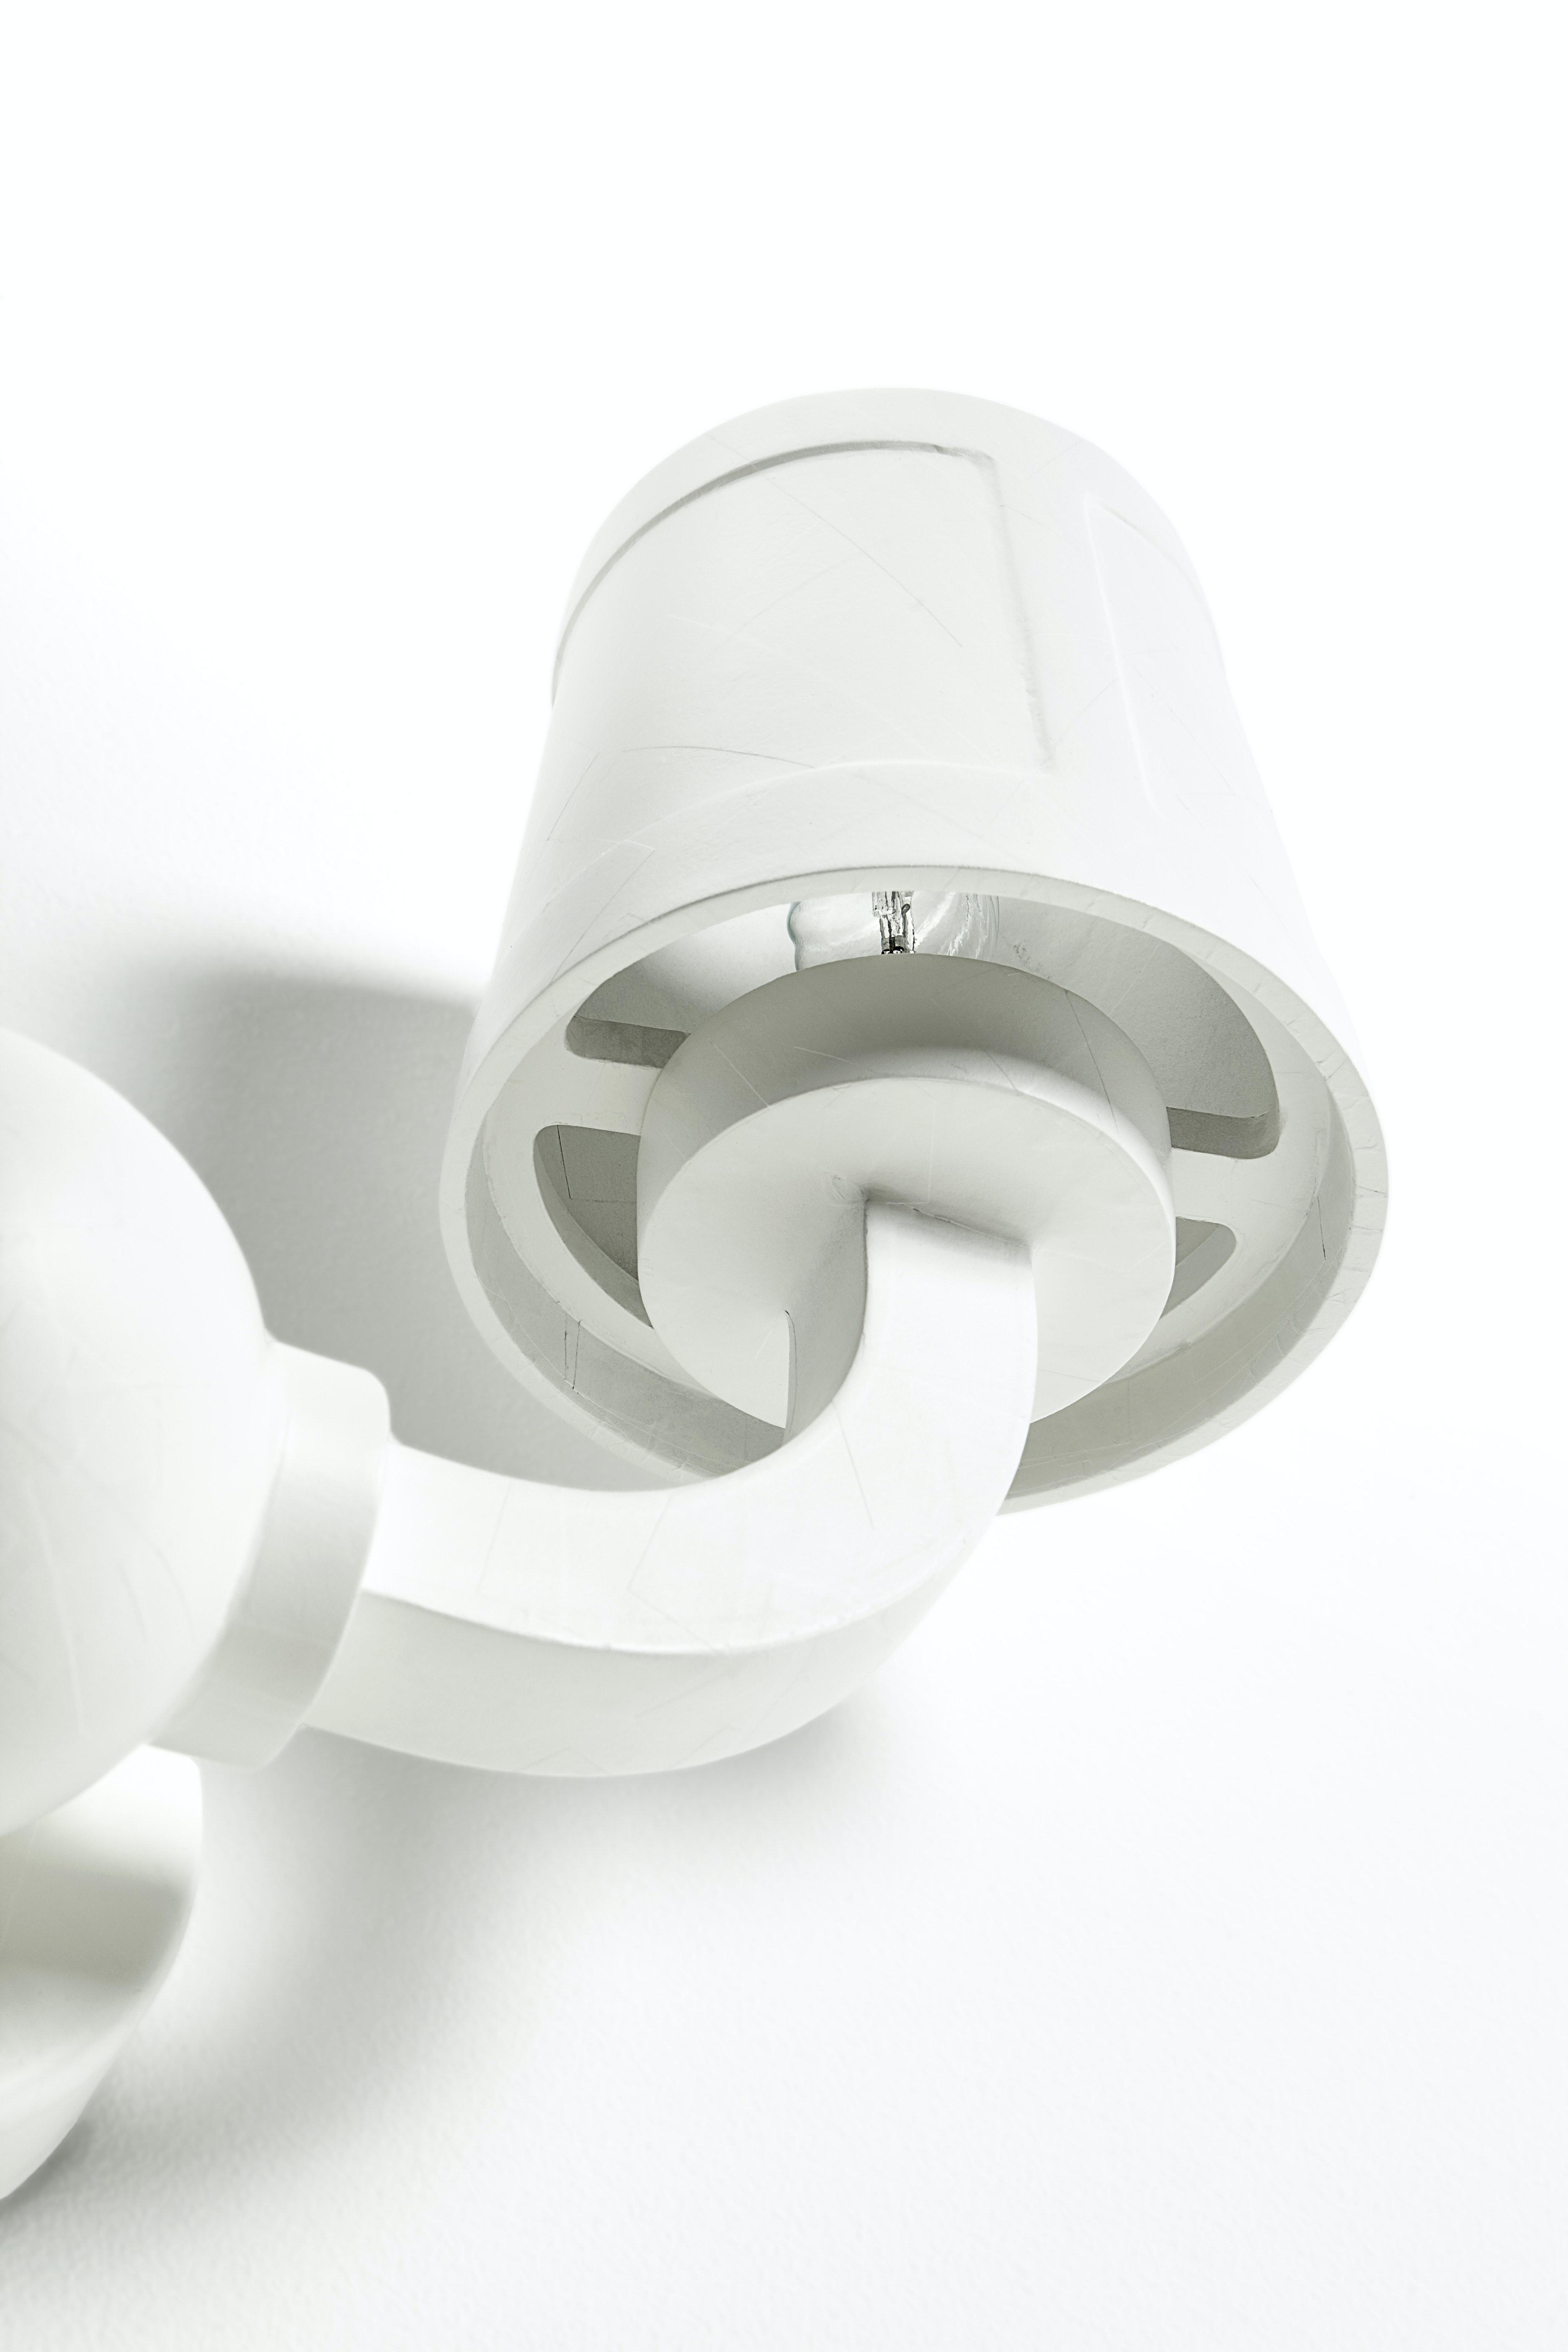 Paper Wall Lamp By Studio Job For Moooi 300Dpi Moooi